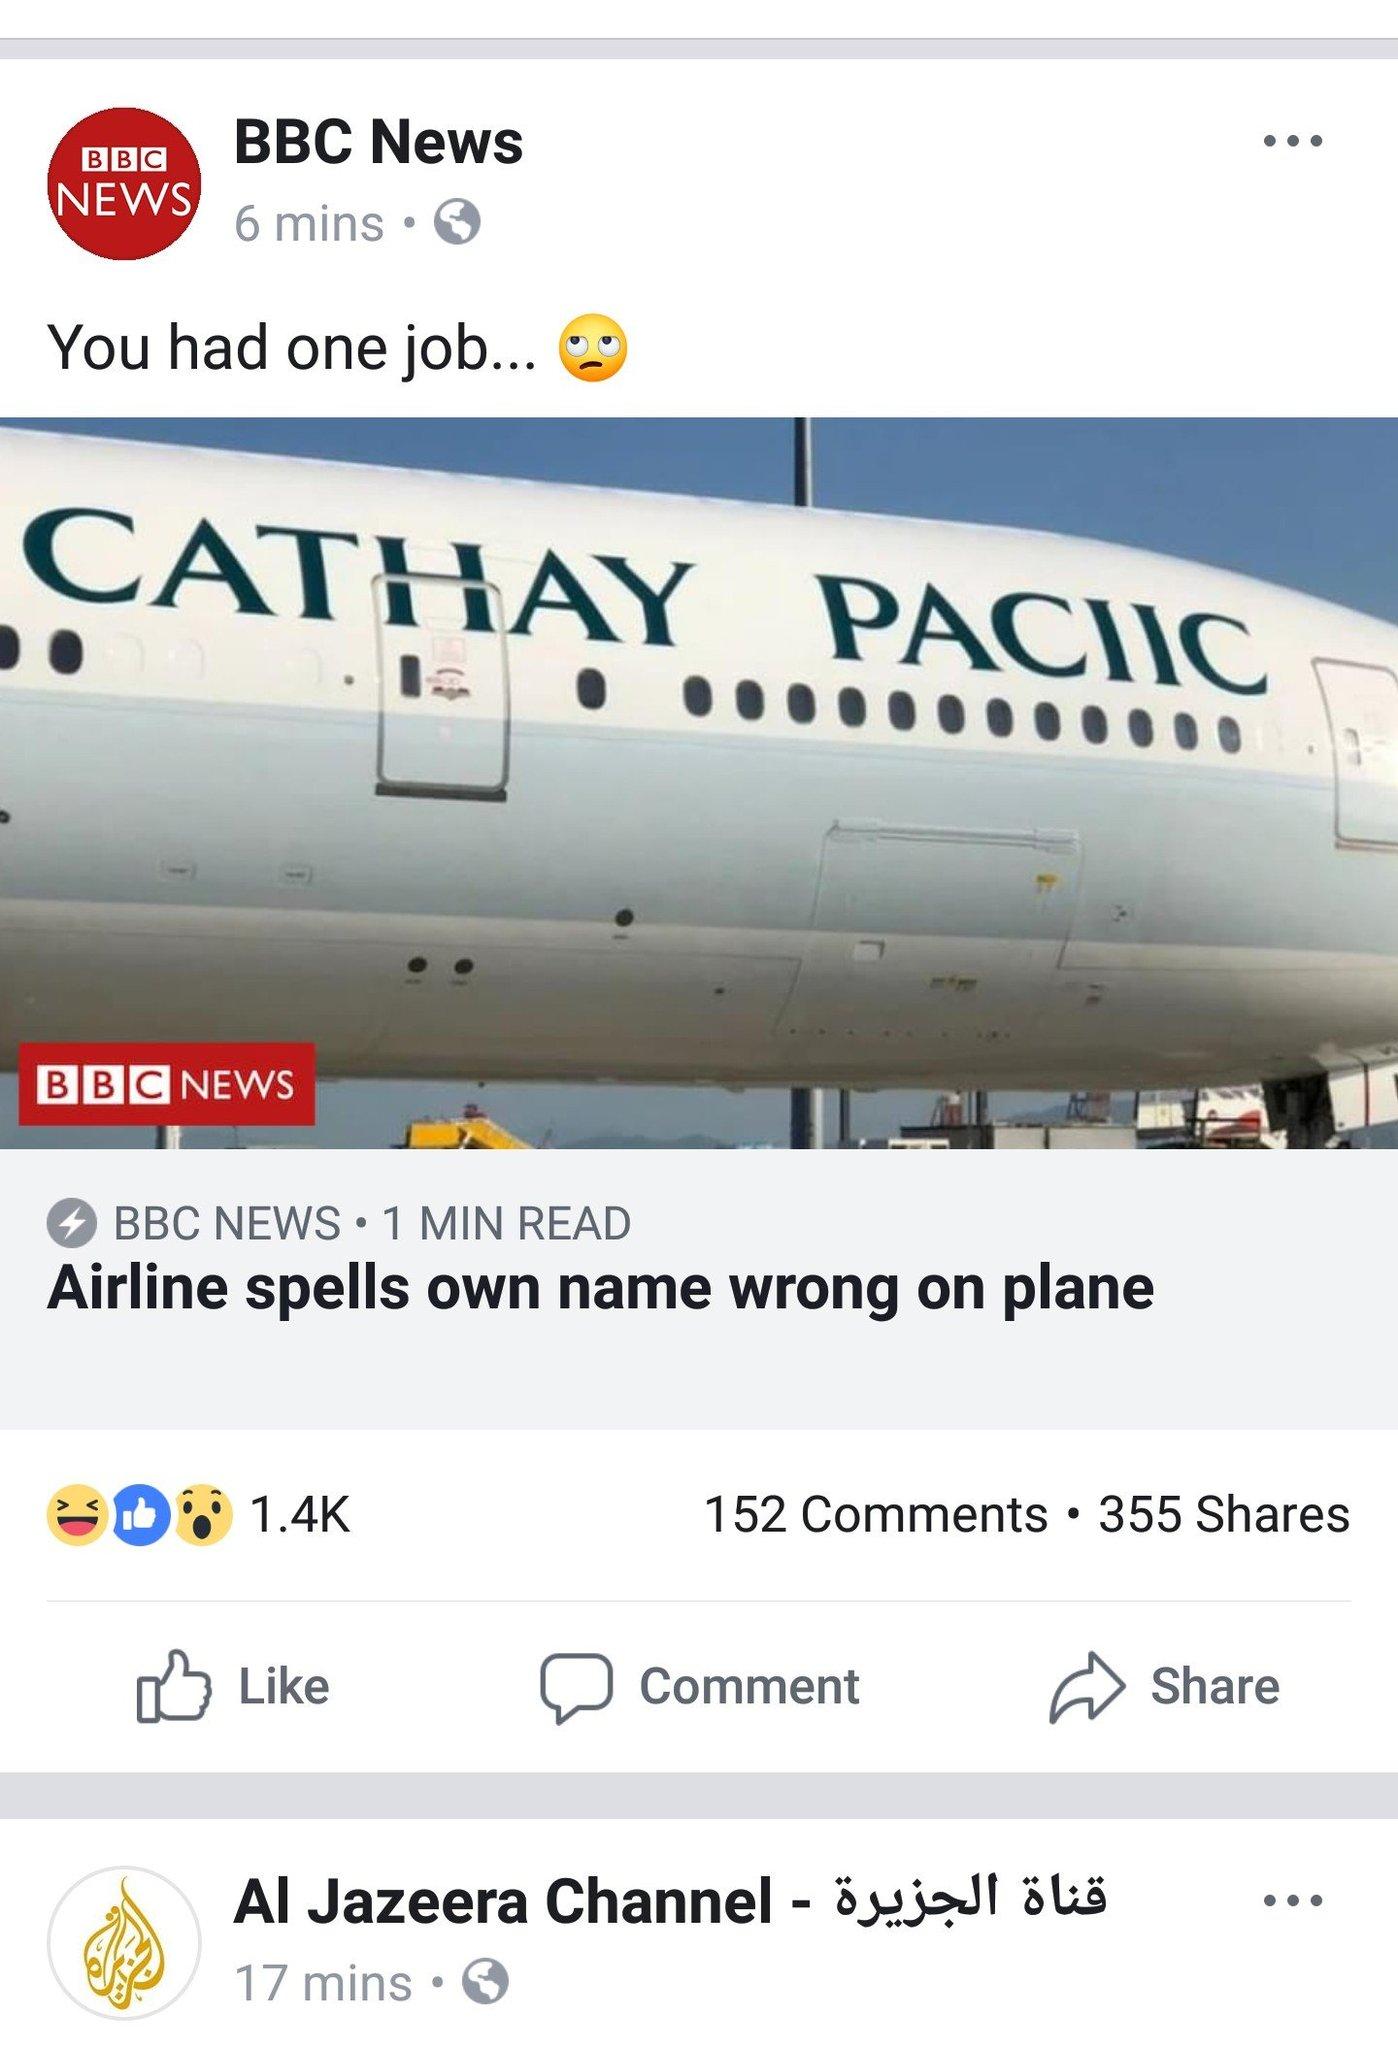 You had one job - meme